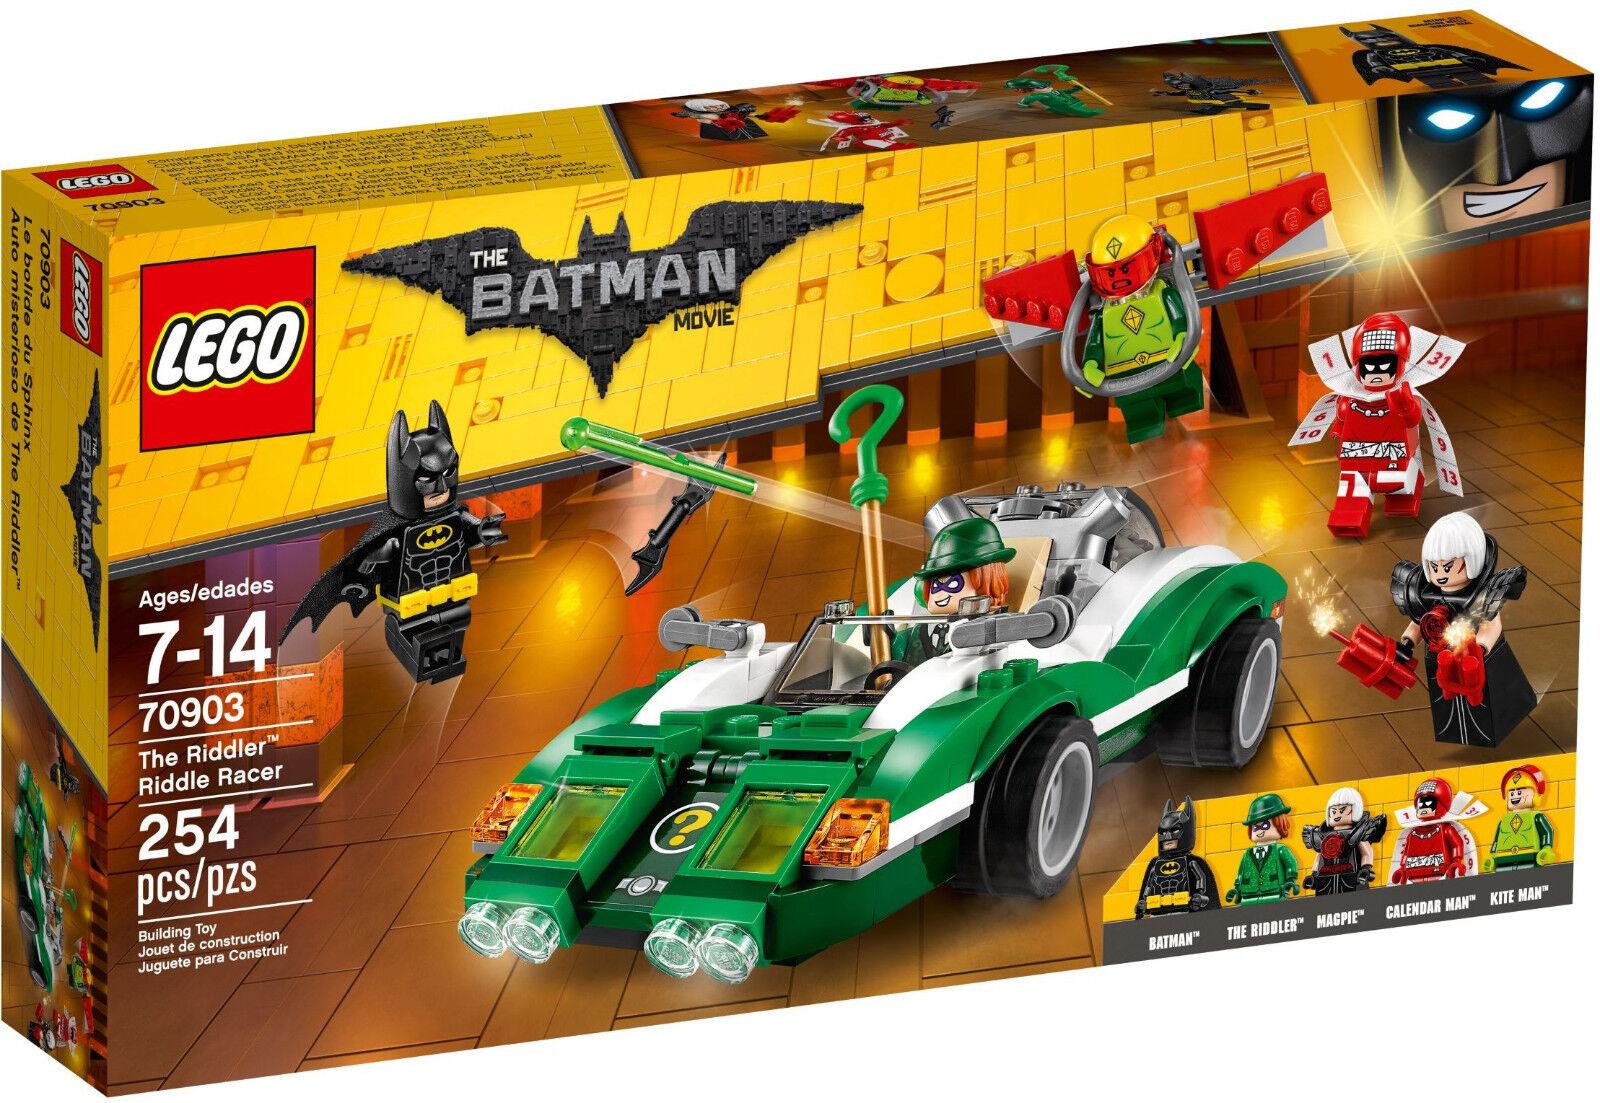 LEGO Batman Movie - 70903 The Riddler Riddle Racer m. Magpie Kite Man - Neu OVP